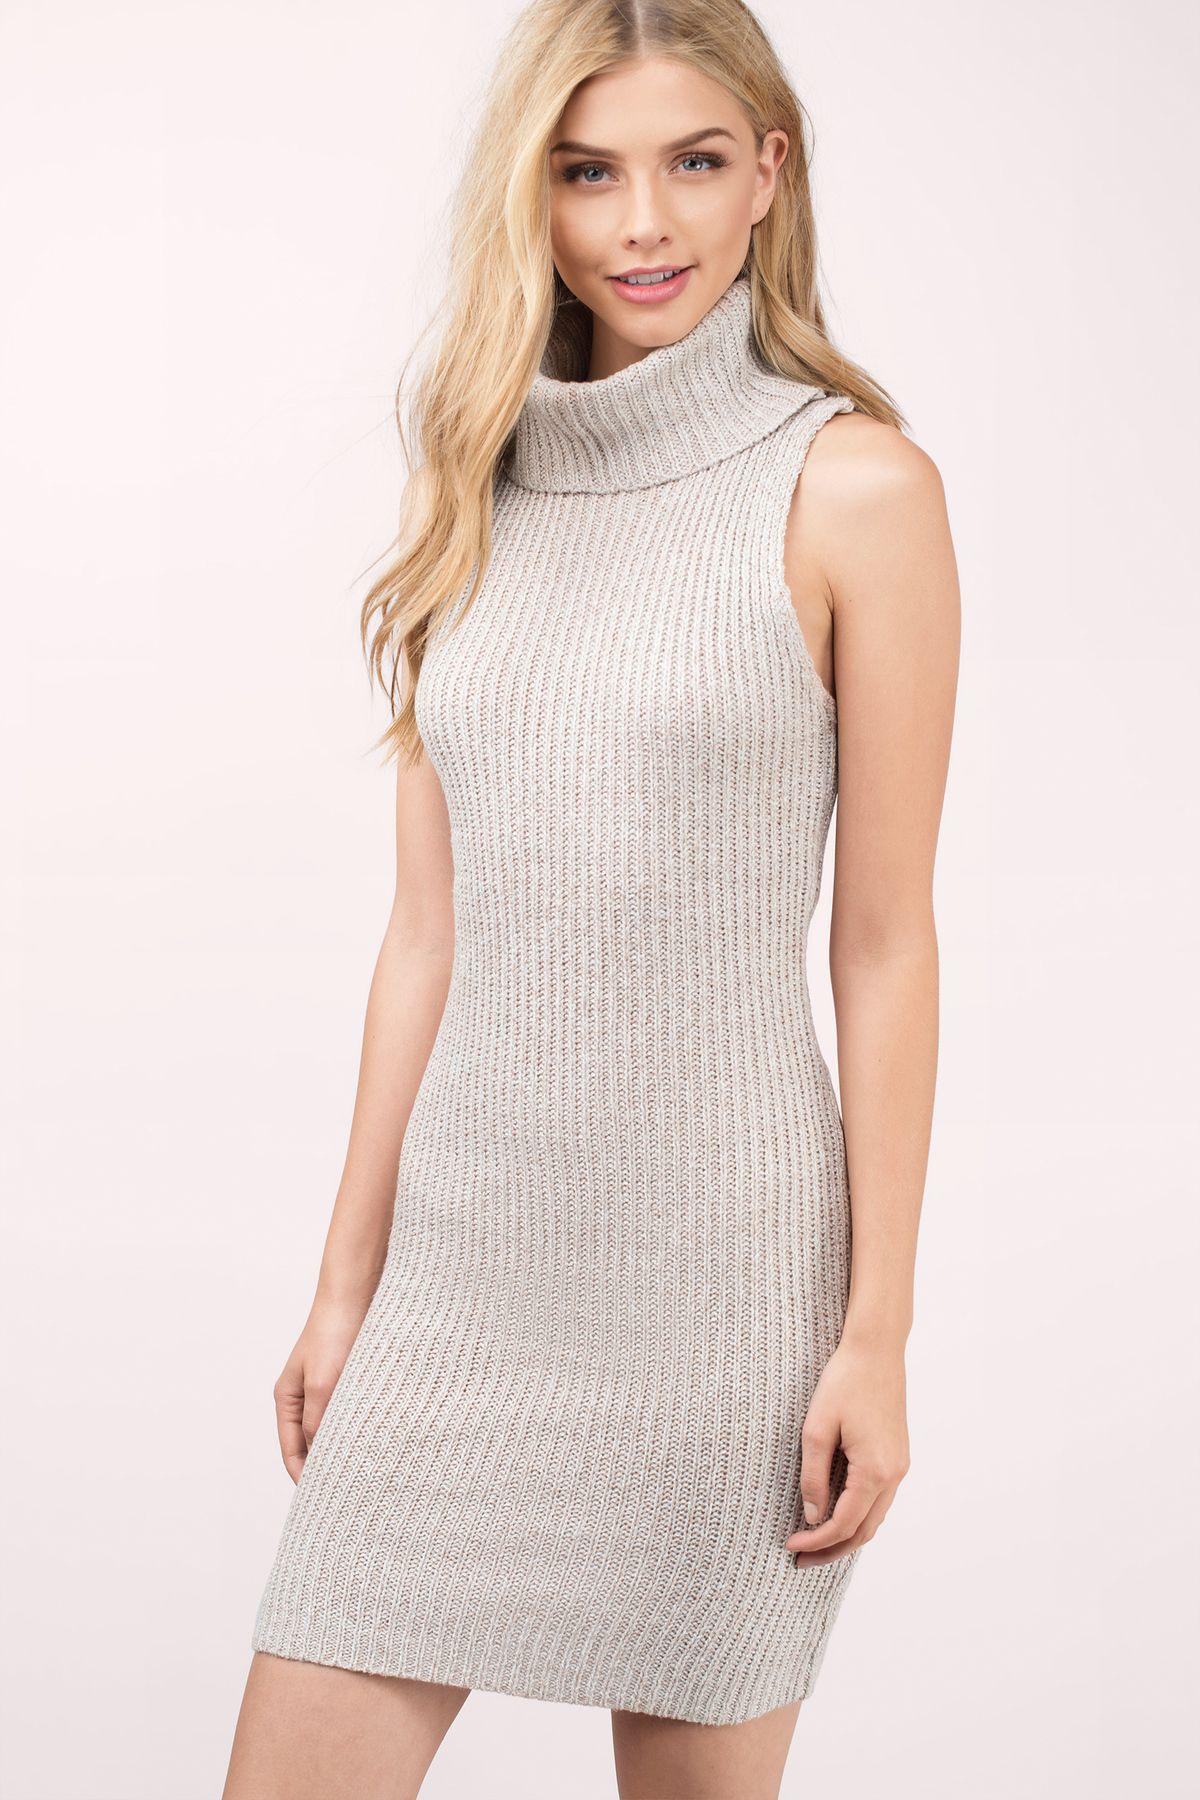 Kerri Turtleneck Sweater Dress In Toast Sweater Dress Turtleneck Dress Sleeveless Turtle Neck Dress [ 1800 x 1200 Pixel ]